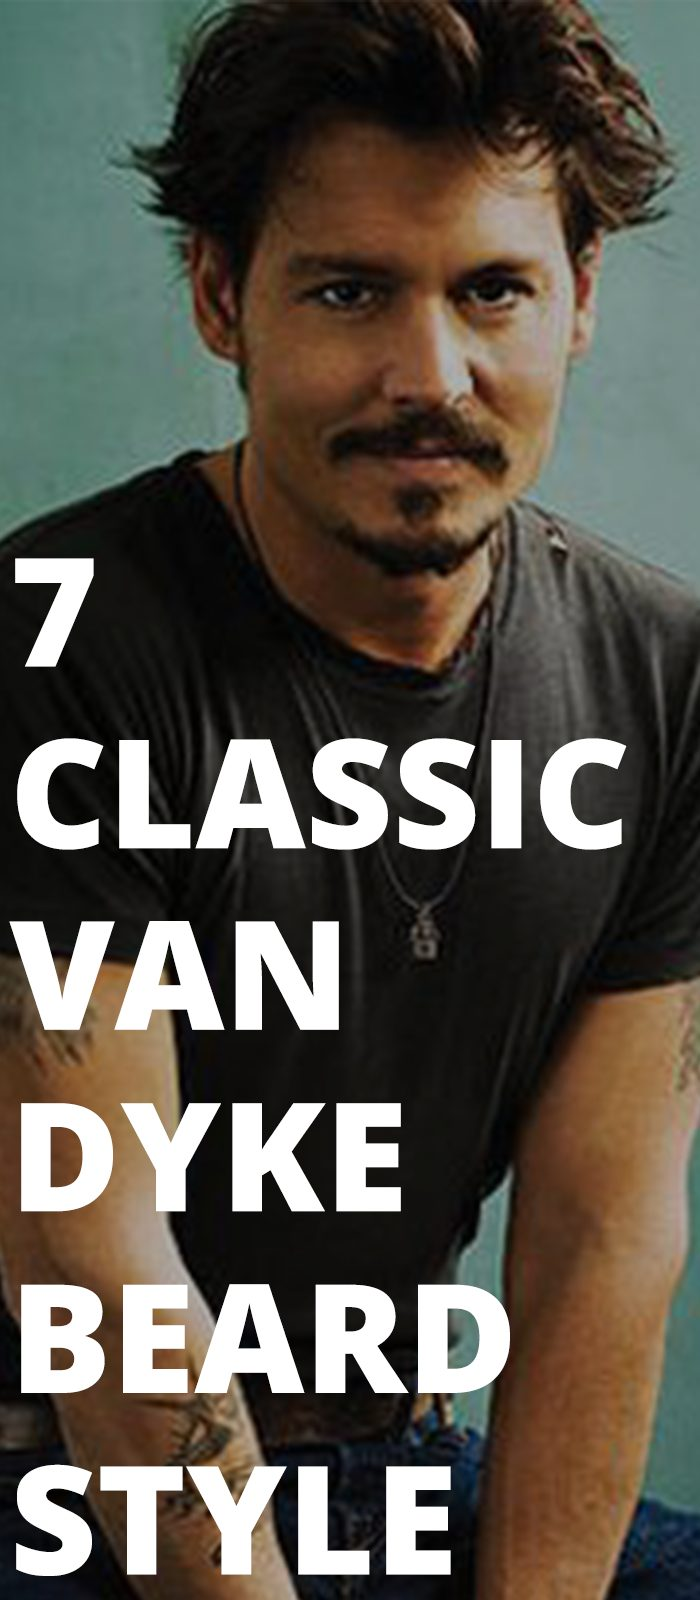 7 Classic Van Dyke Beard Style